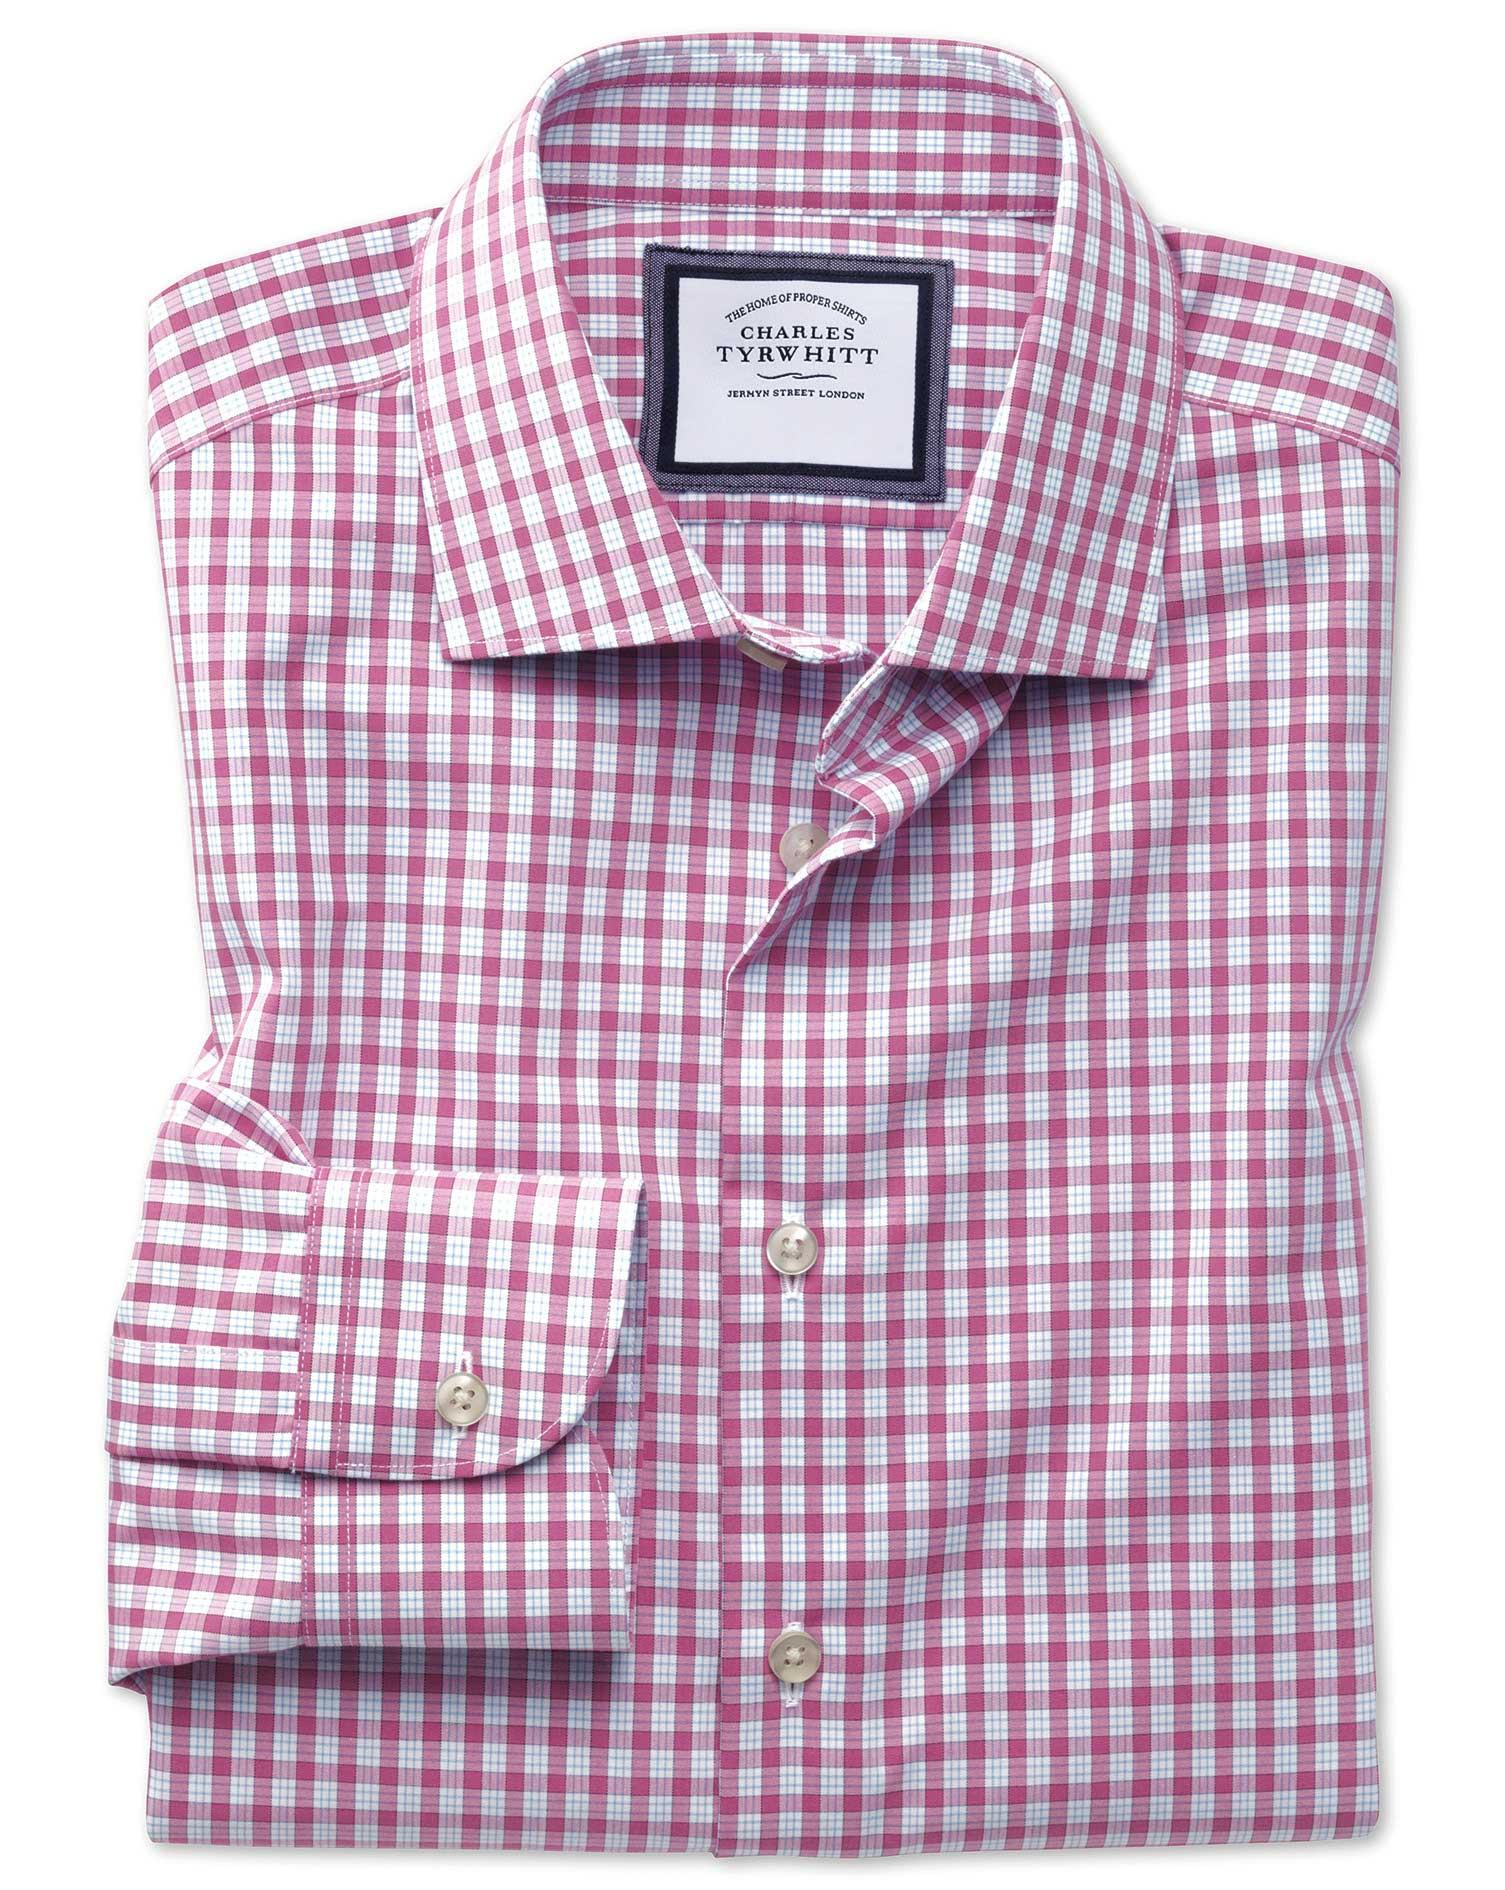 Slim Fit Semi-Cutaway Non-Iron Business Casual Pink Check Cotton Formal Shirt Single Cuff Size 17/38